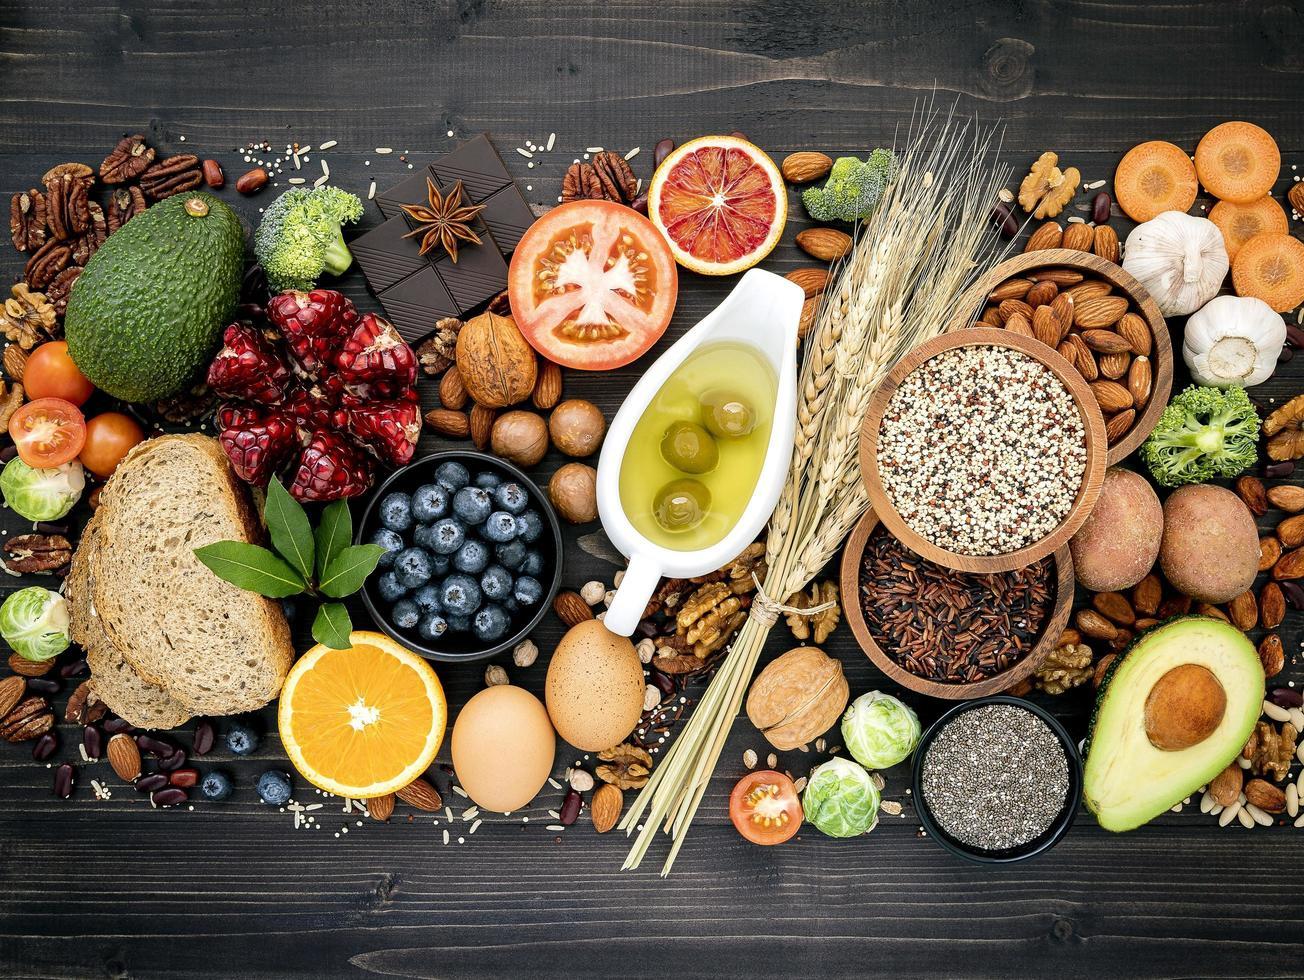 Healthy diet ingredients photo